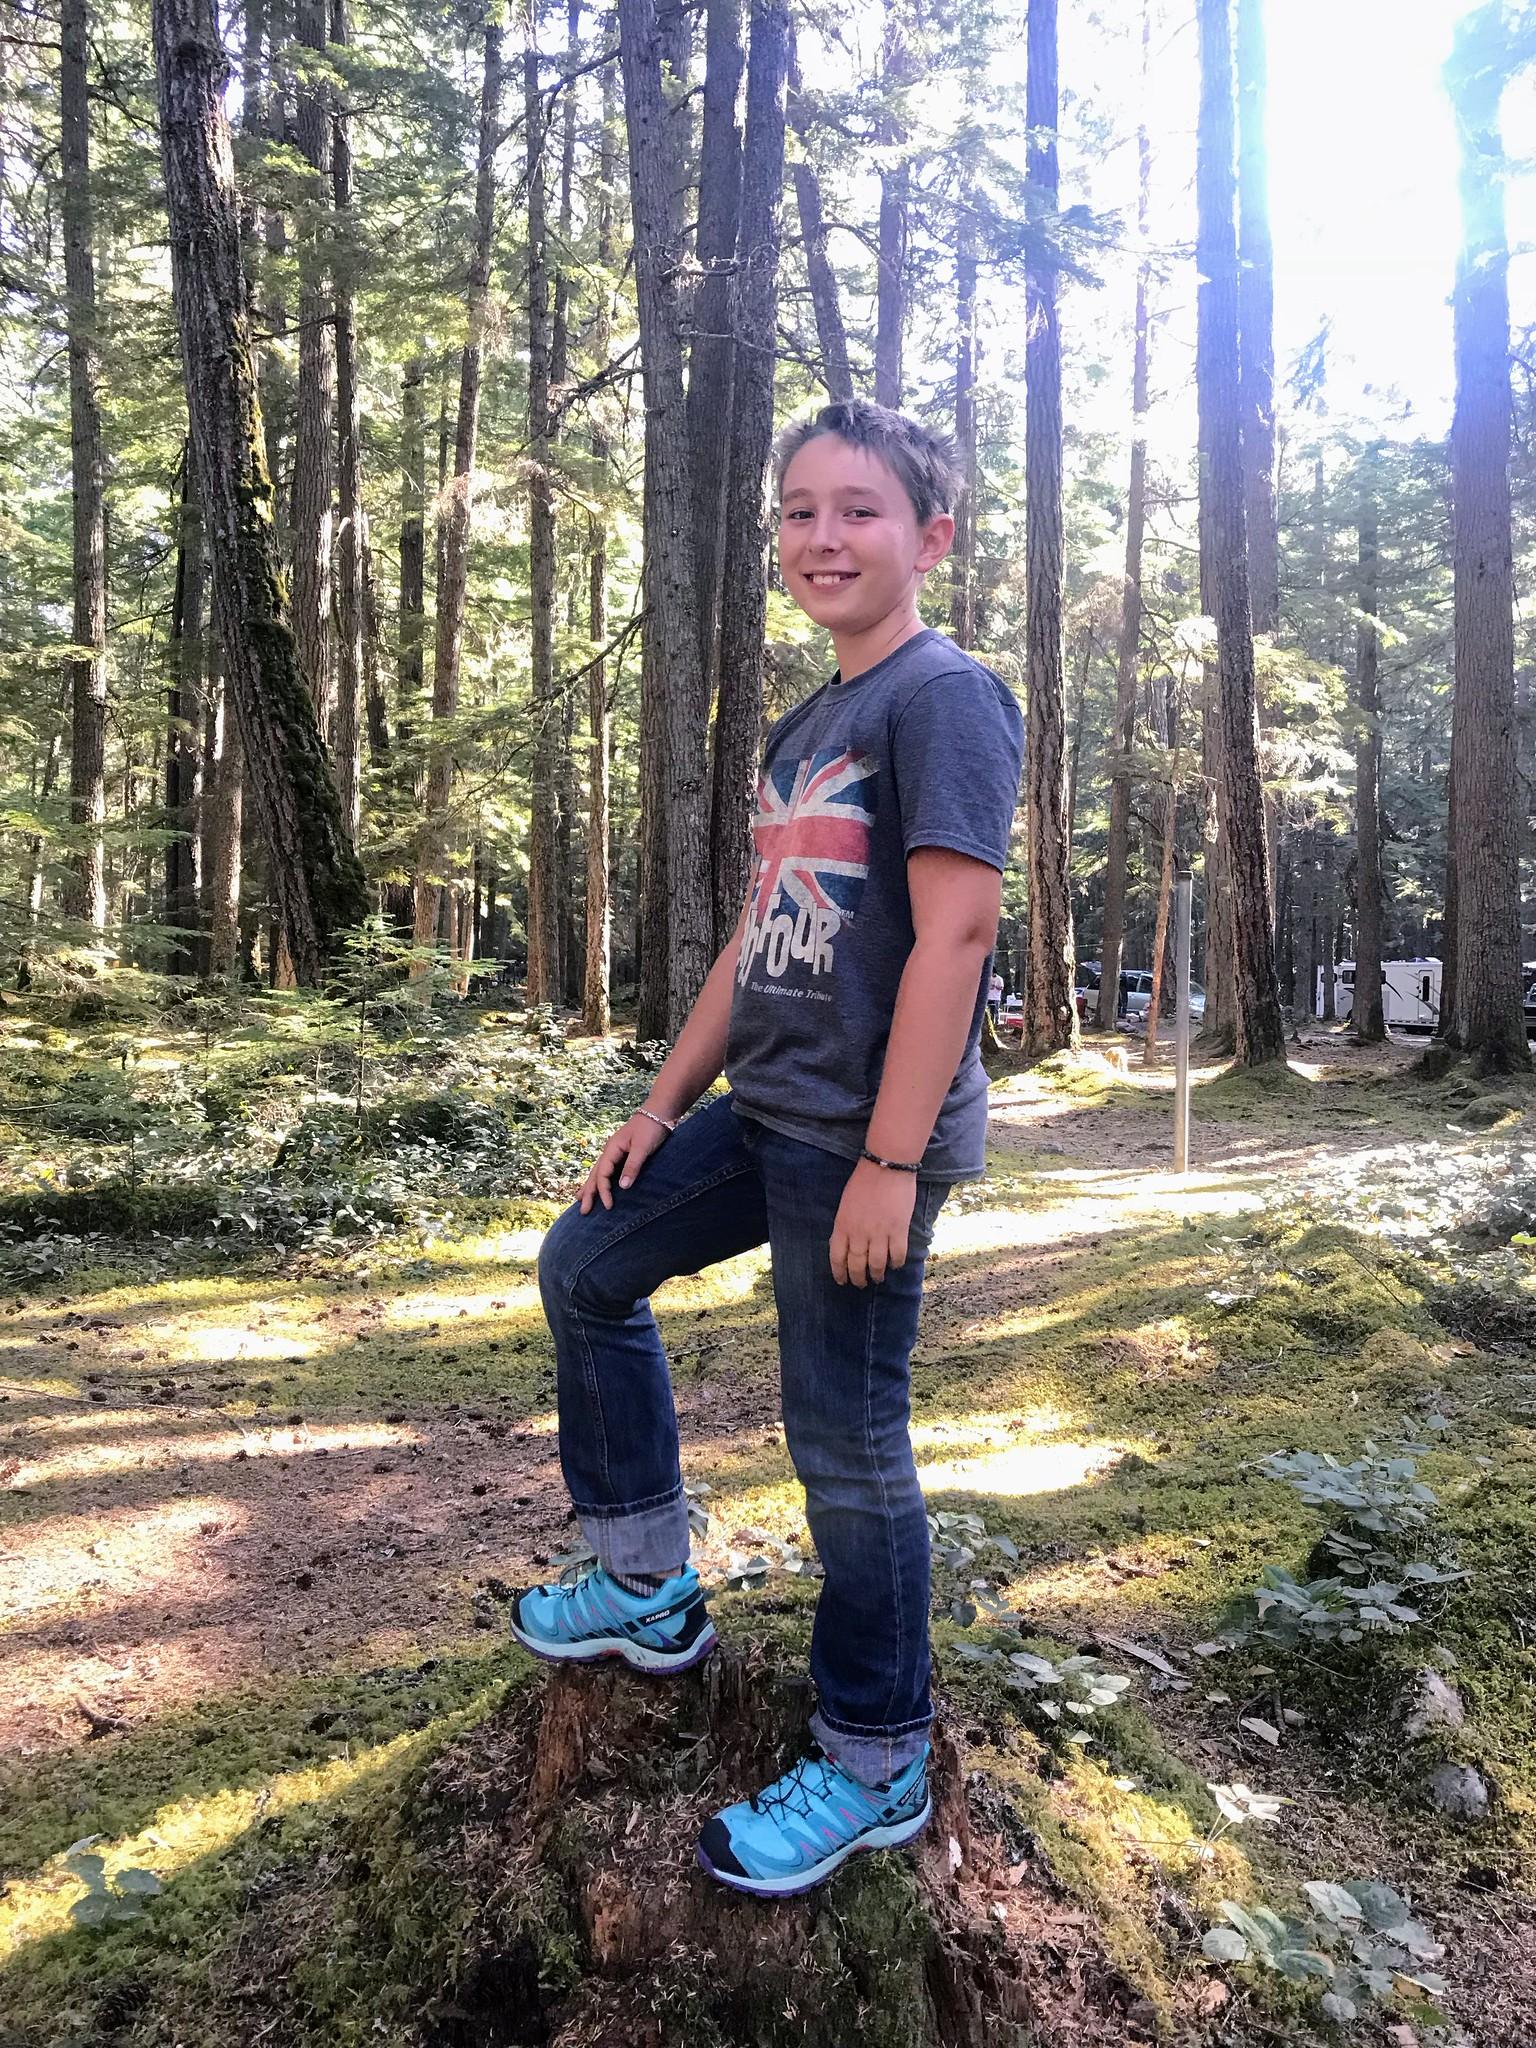 Casper at Buck Creek Campground